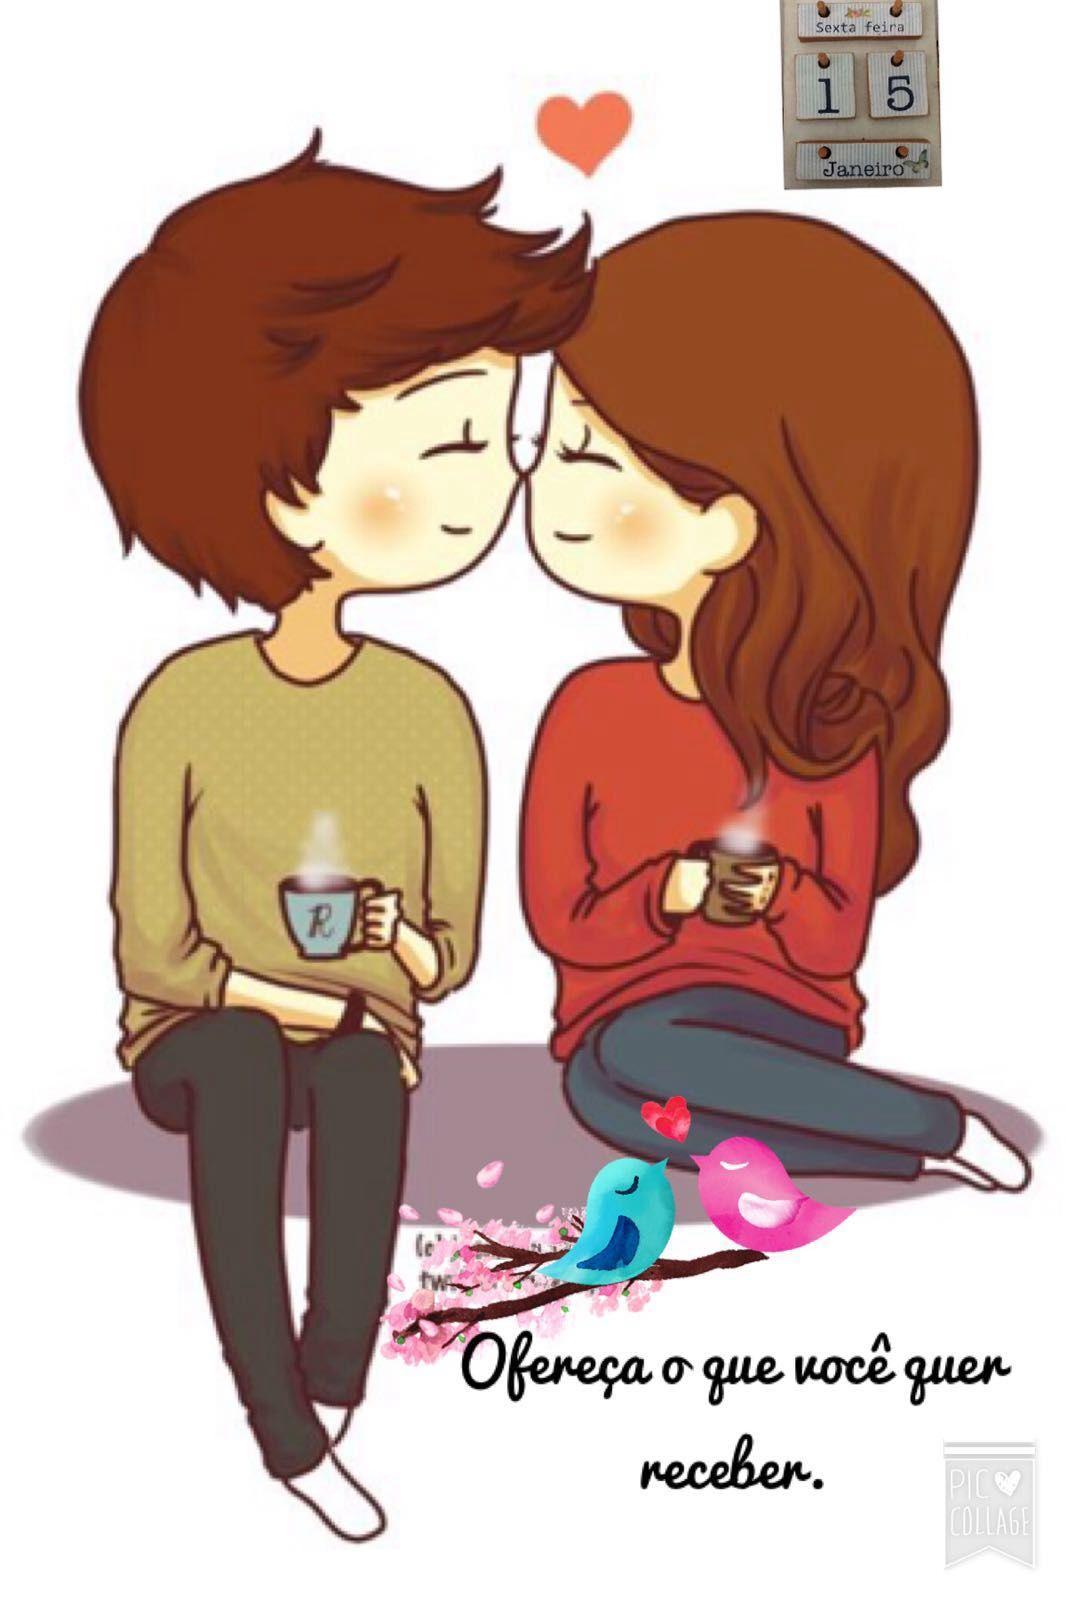 Pin By K J On Calendario 2016 Cute Love Couple Love Cartoon Couple Cute Love Cartoons